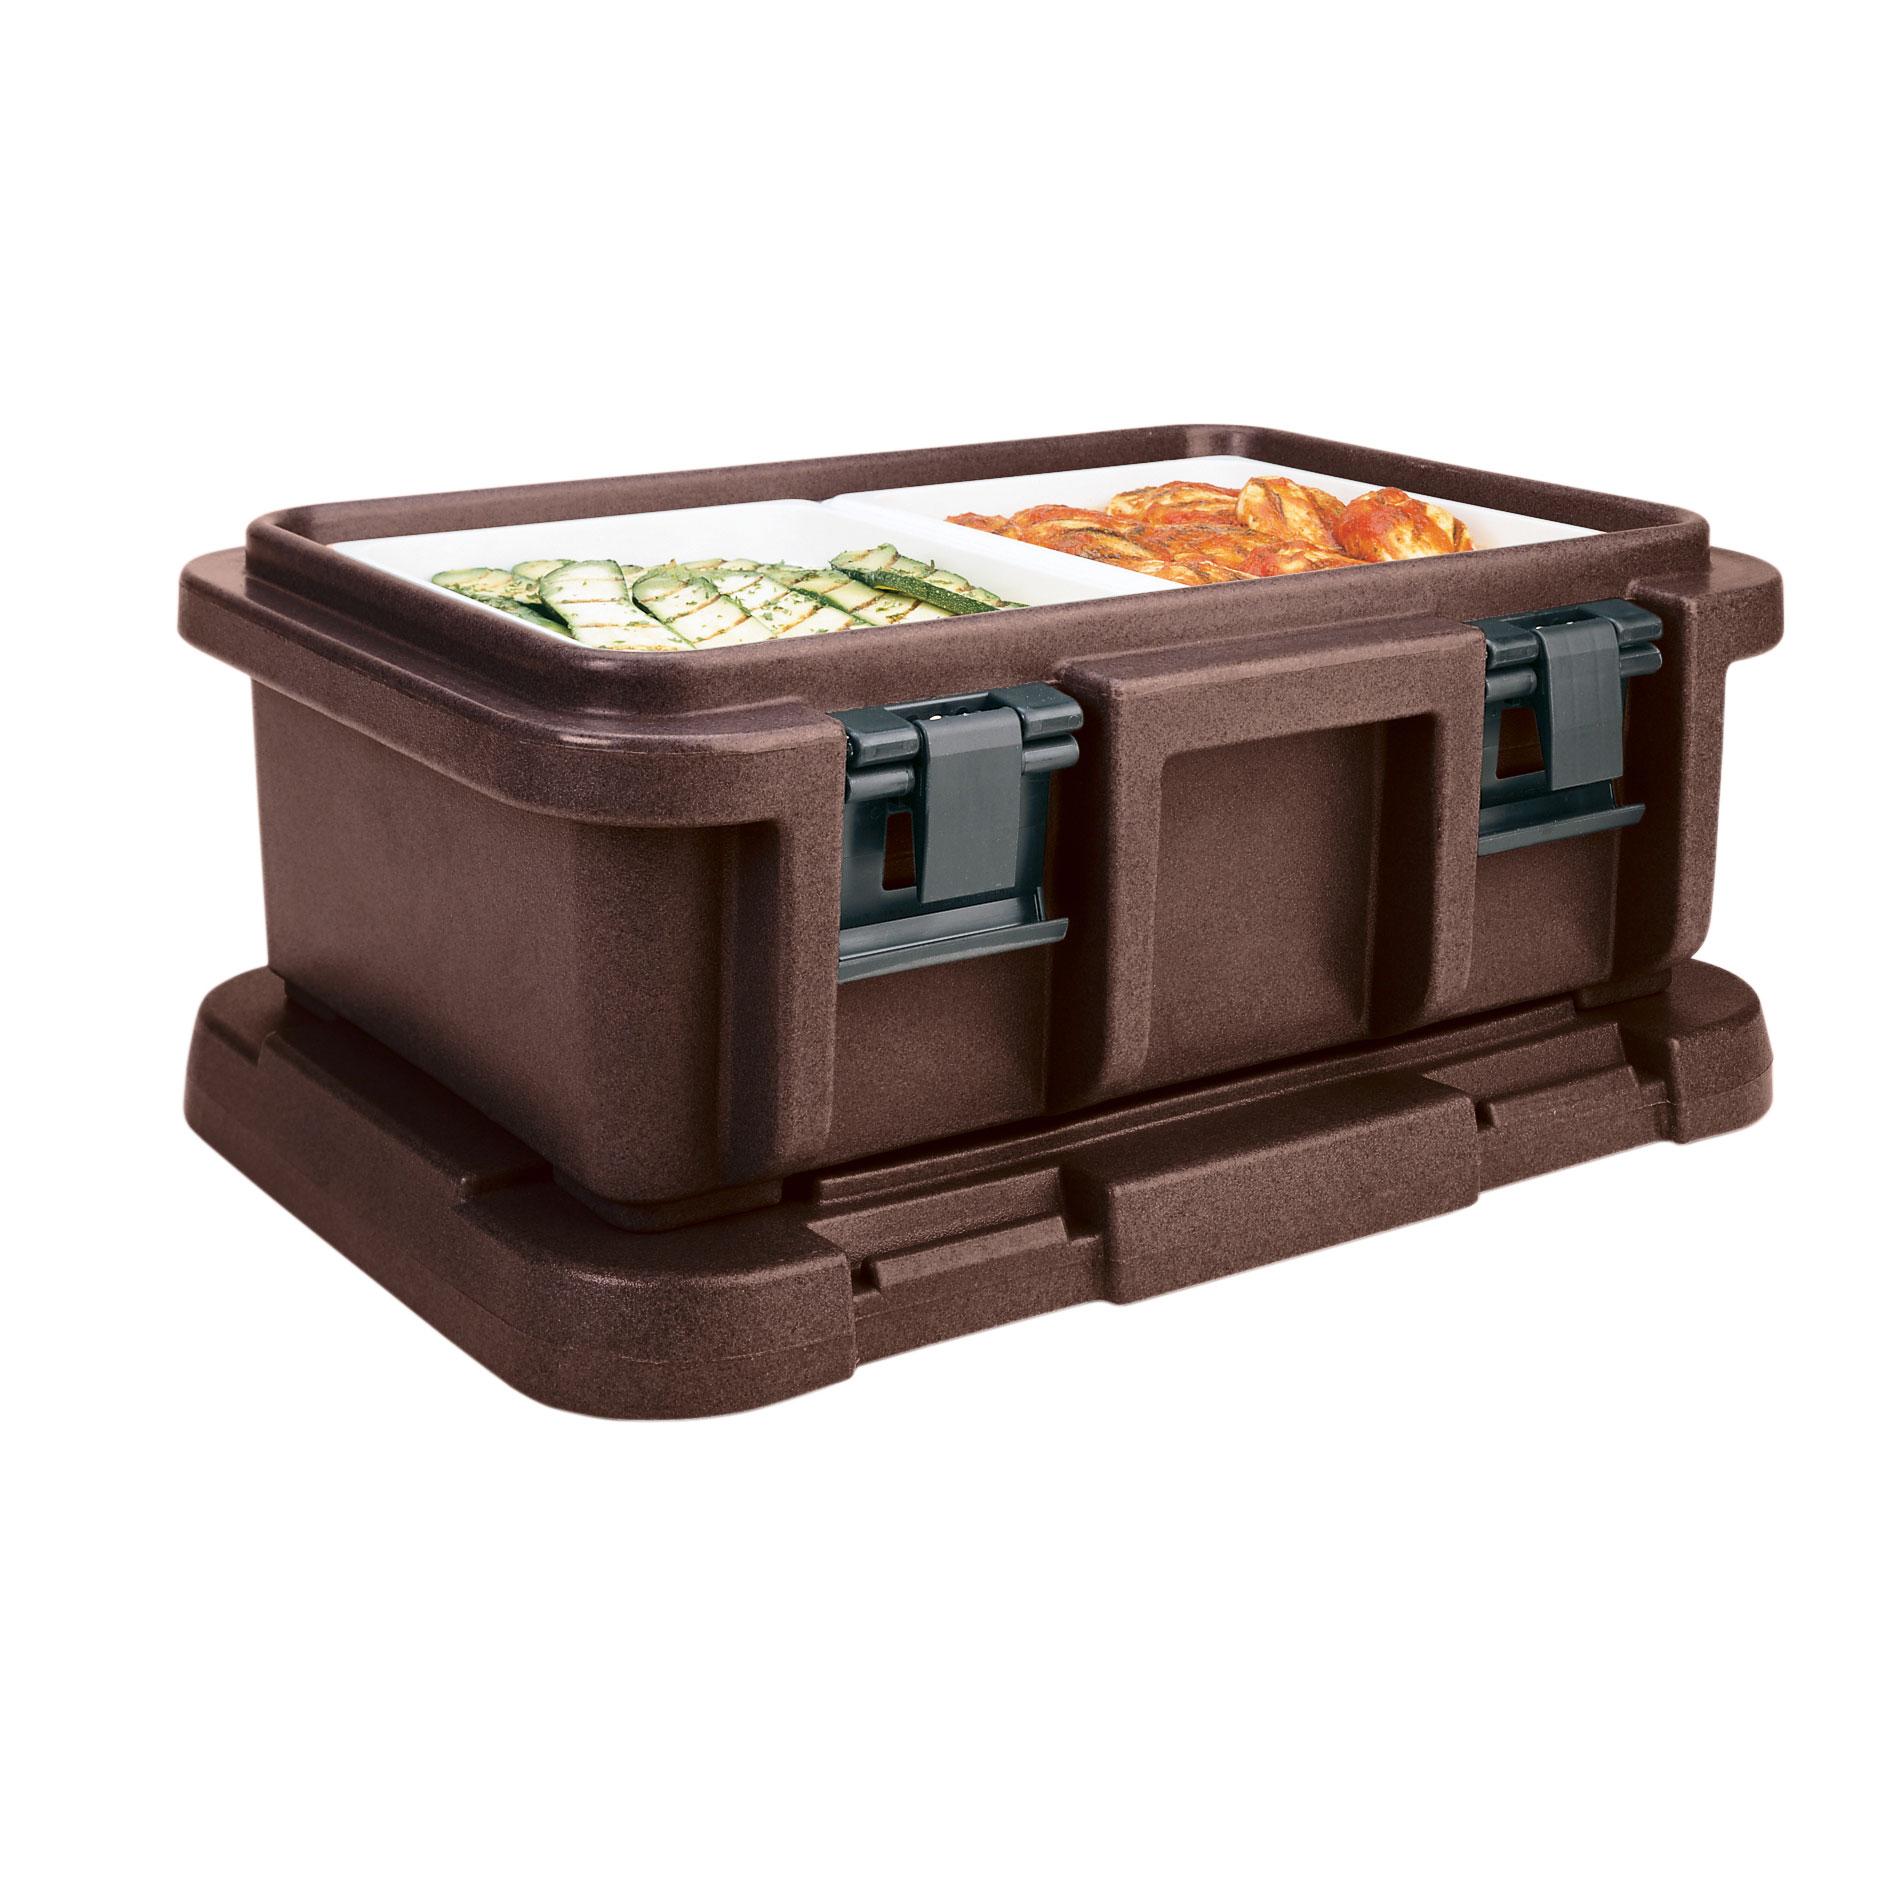 Cambro UPC160131 food pan carriers